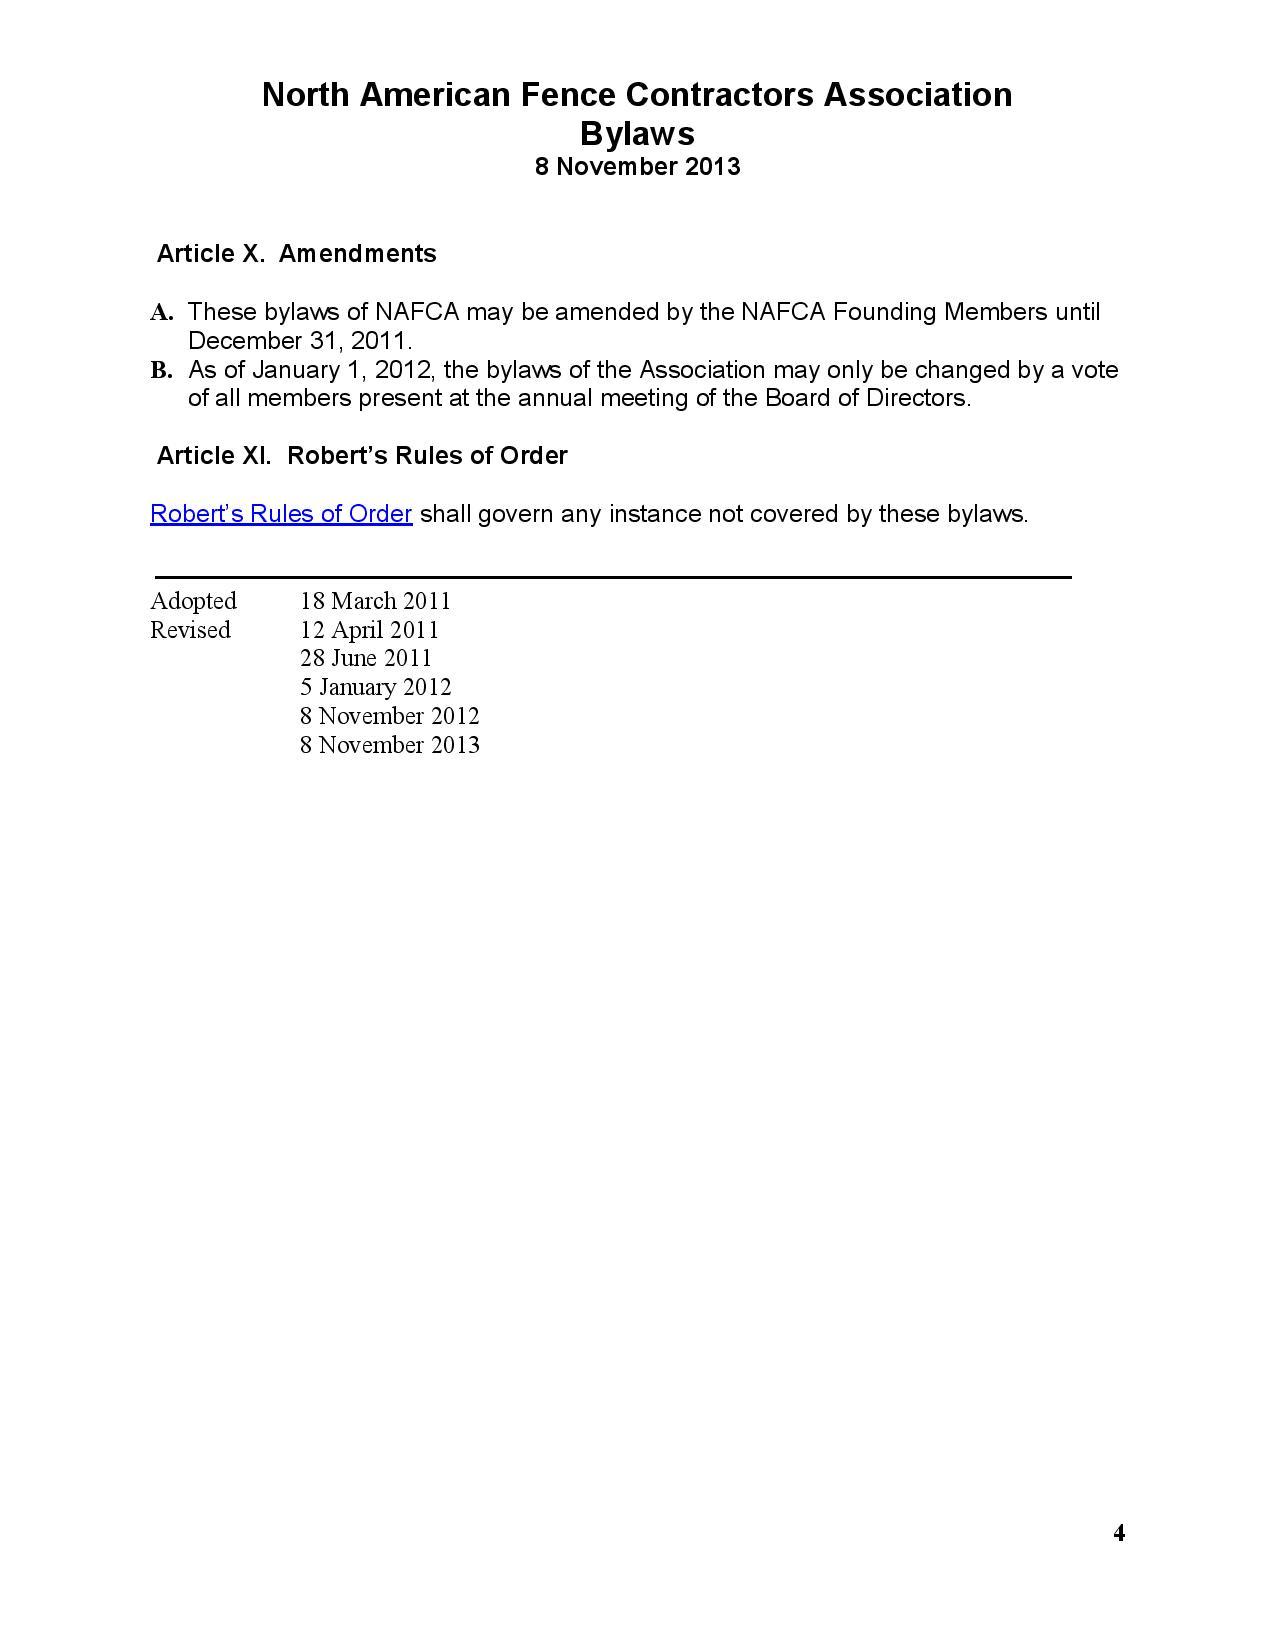 Bylaws 8 Nov 2013-page-004